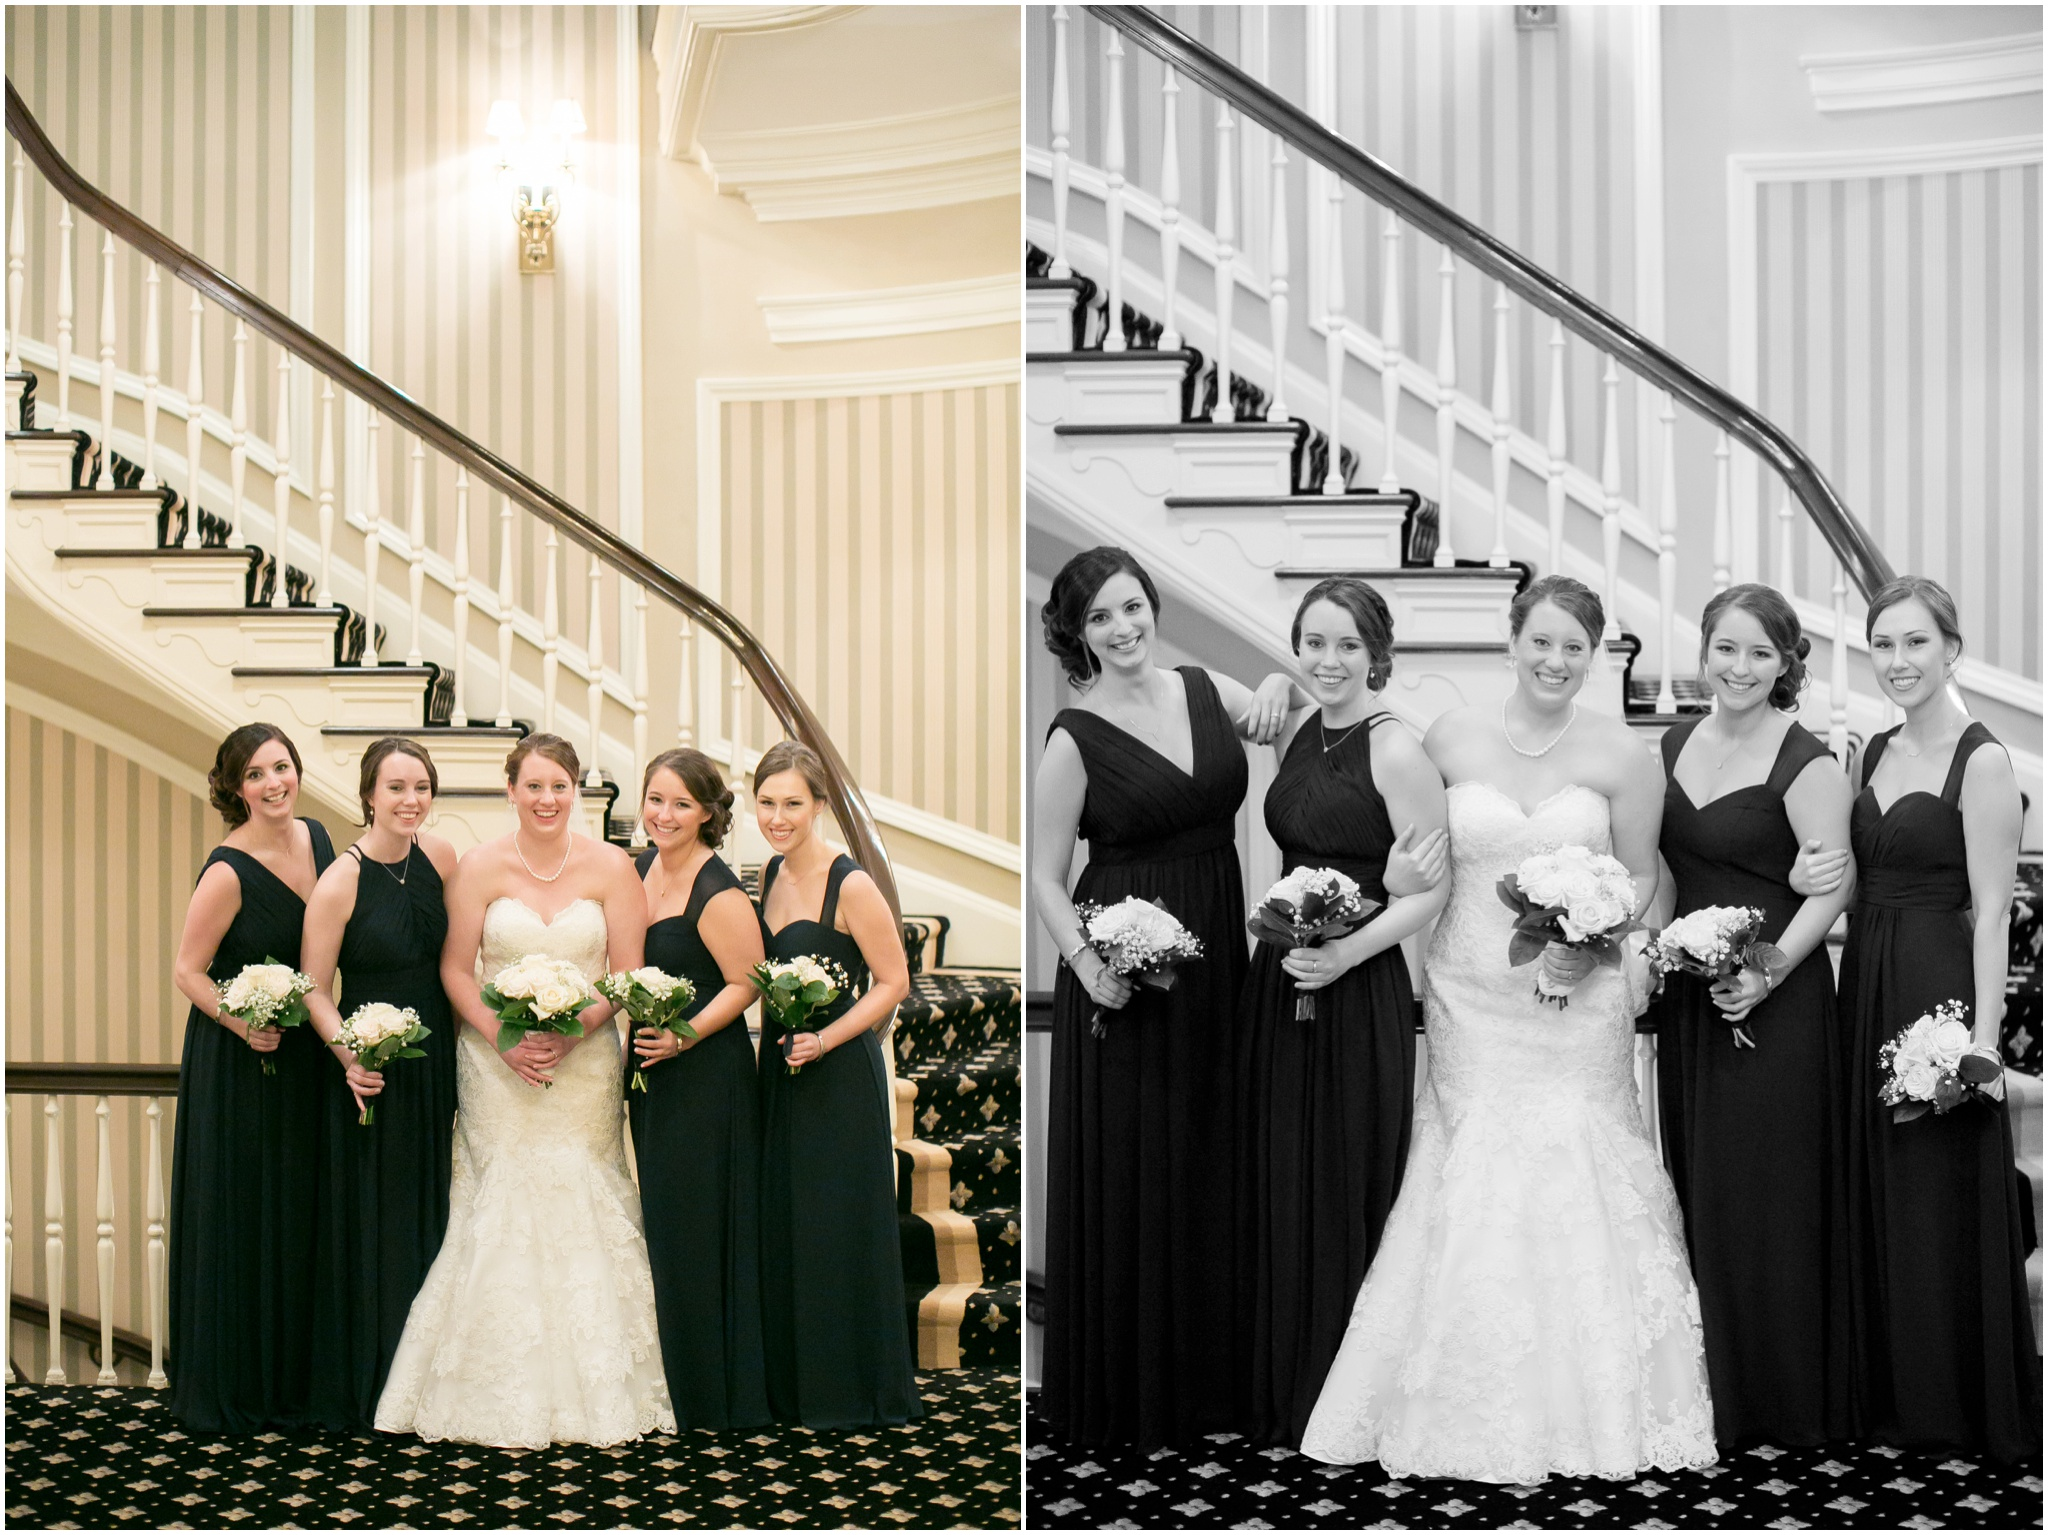 Madison_Club_Madison_Wisconsin_Wedding_Photographer_Spring_Rainy_Wedding_2606.jpg